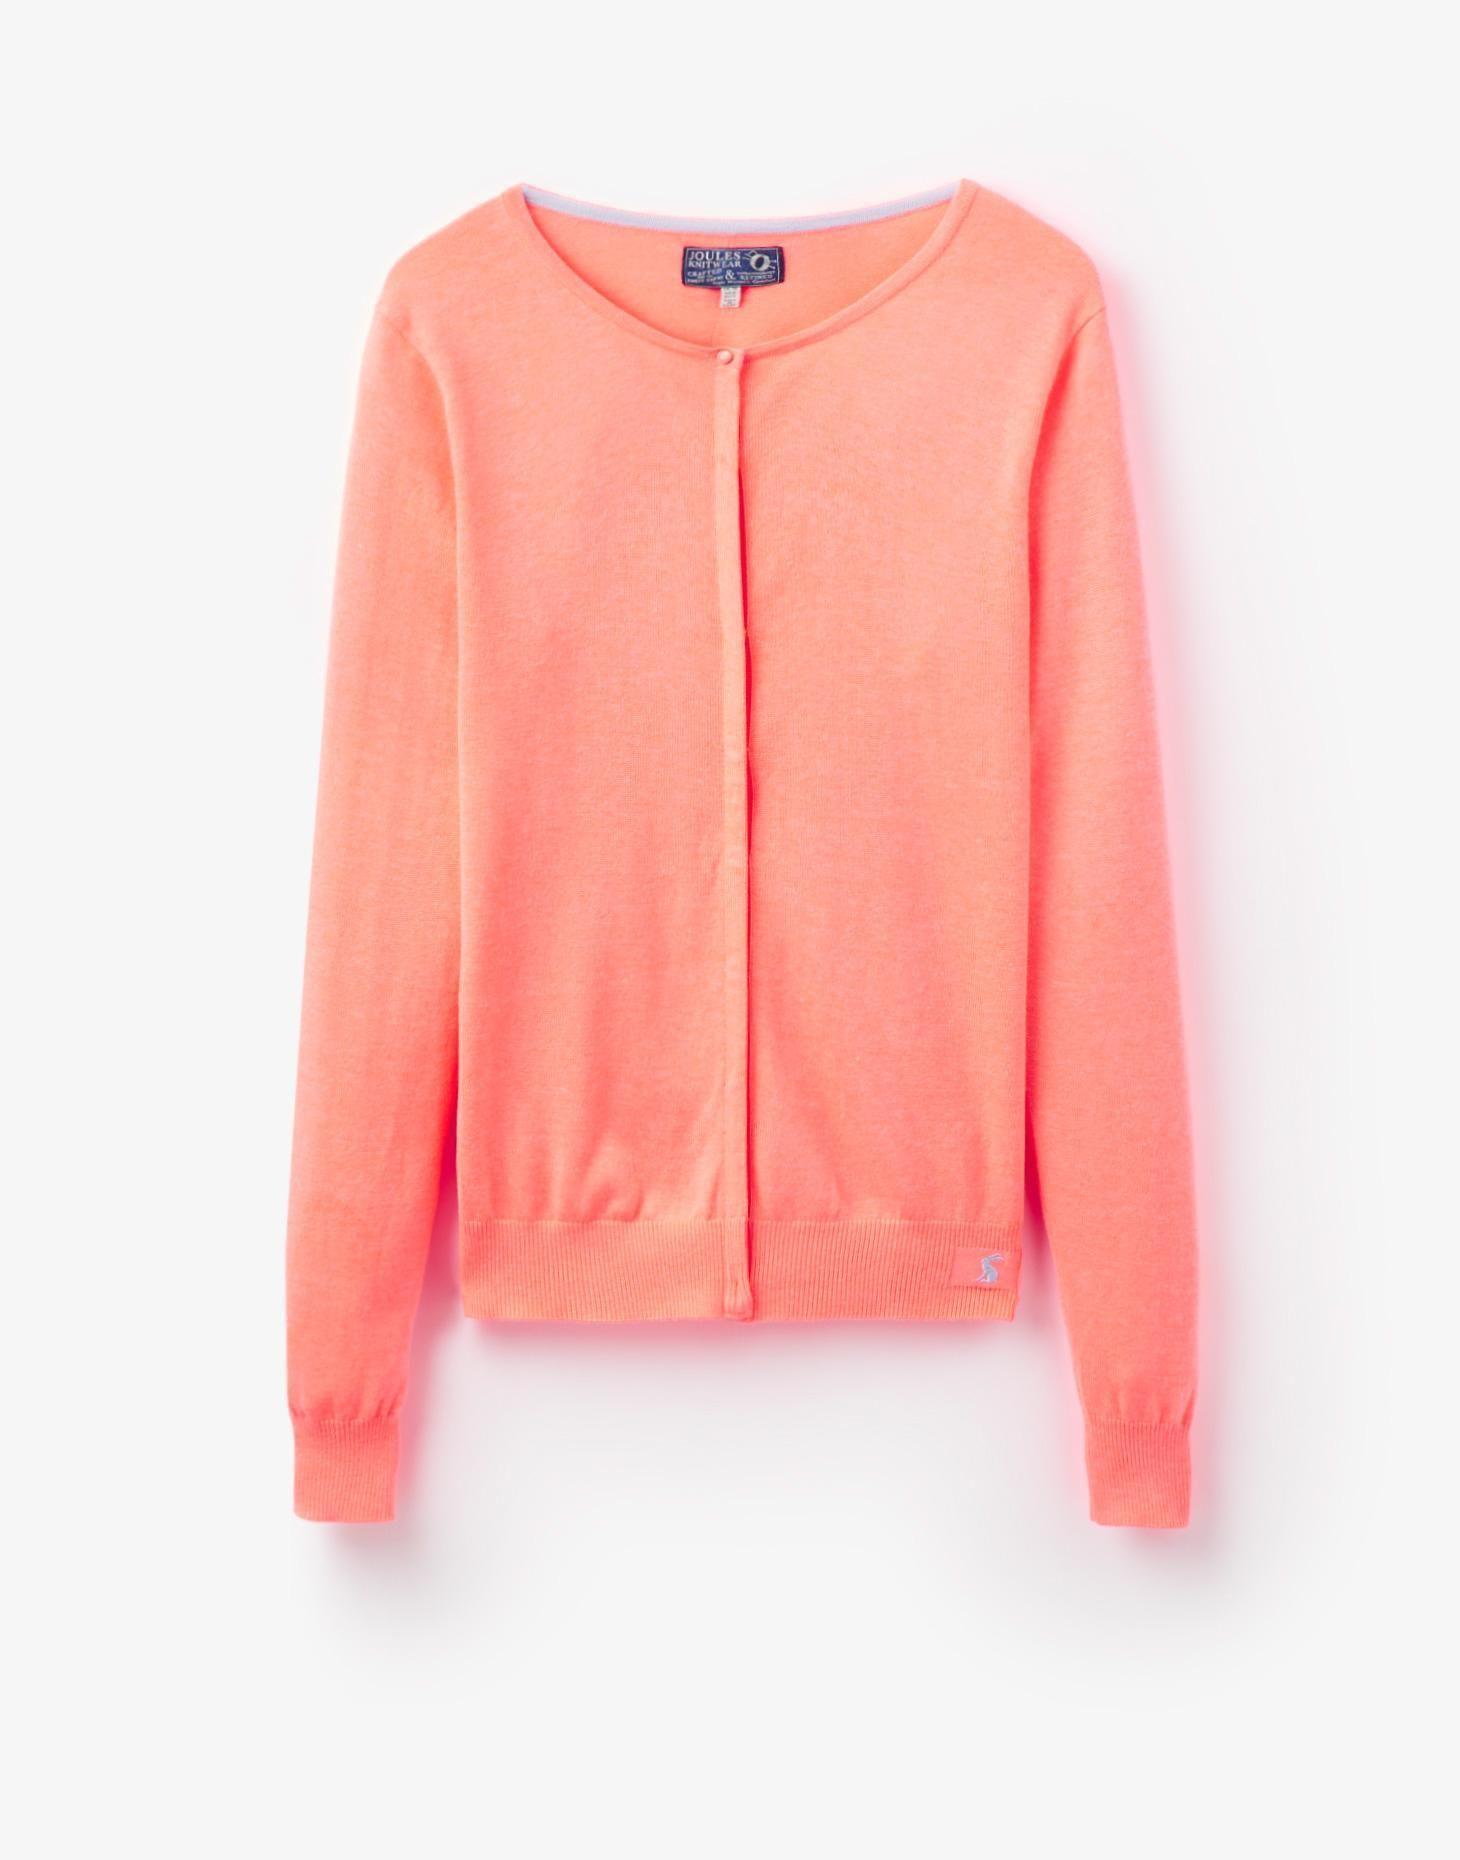 Faith Fluoro Orange Cardigan | Joules UK | Joules | Pinterest ...